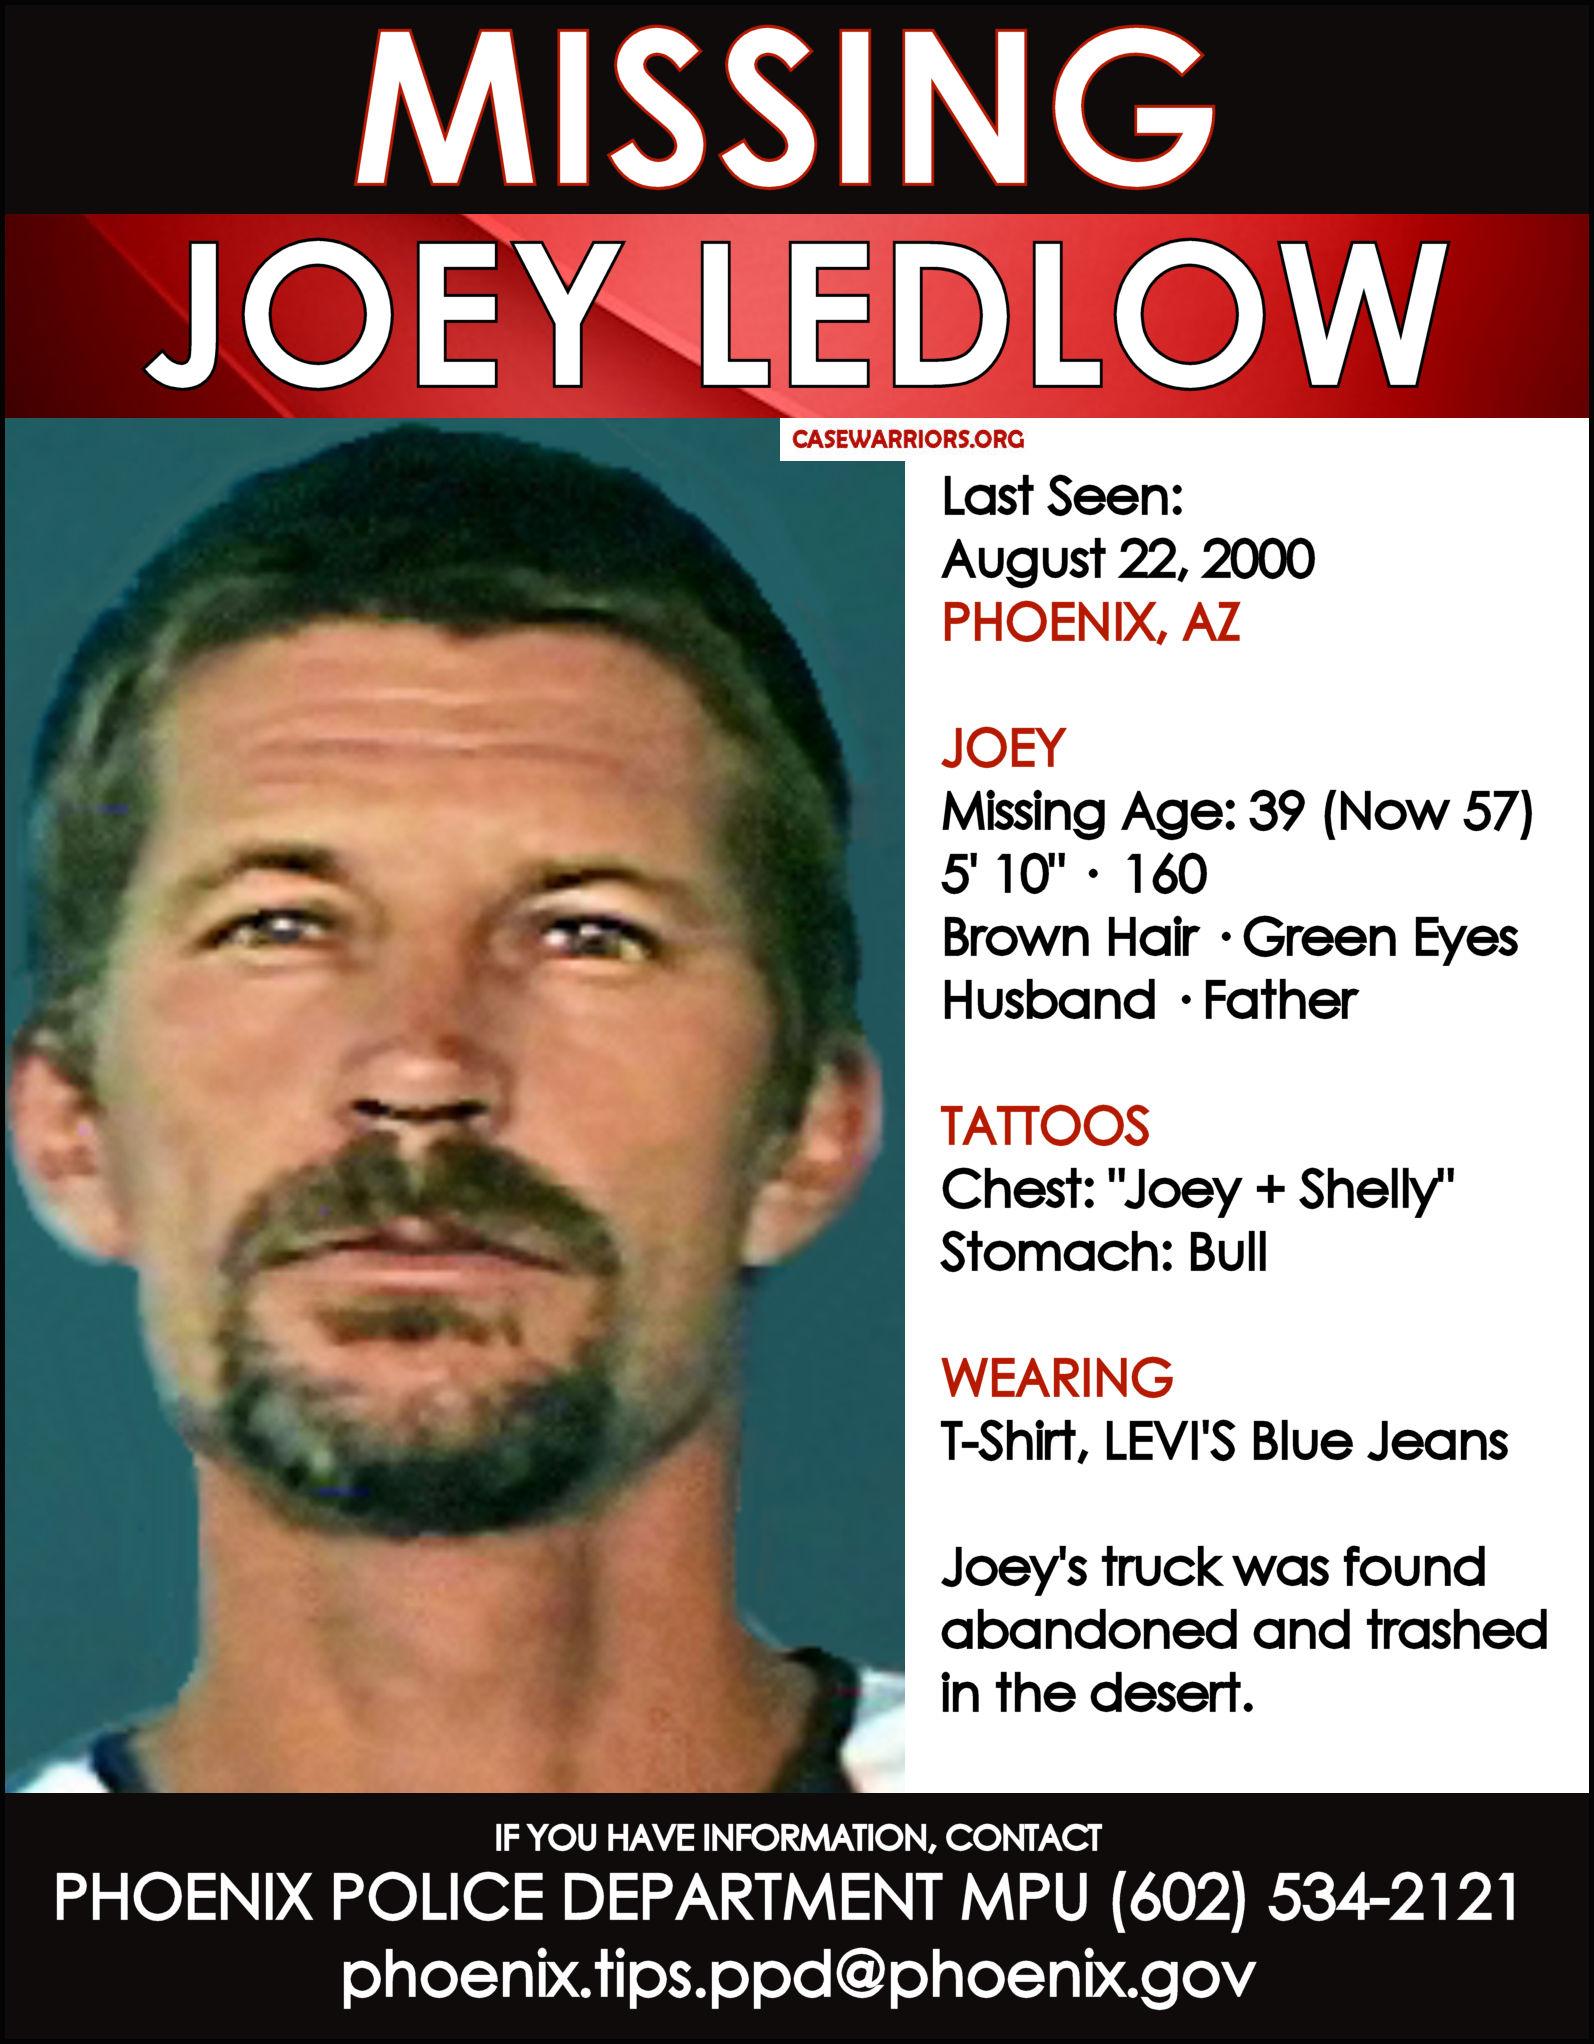 JOEY LEDLOW